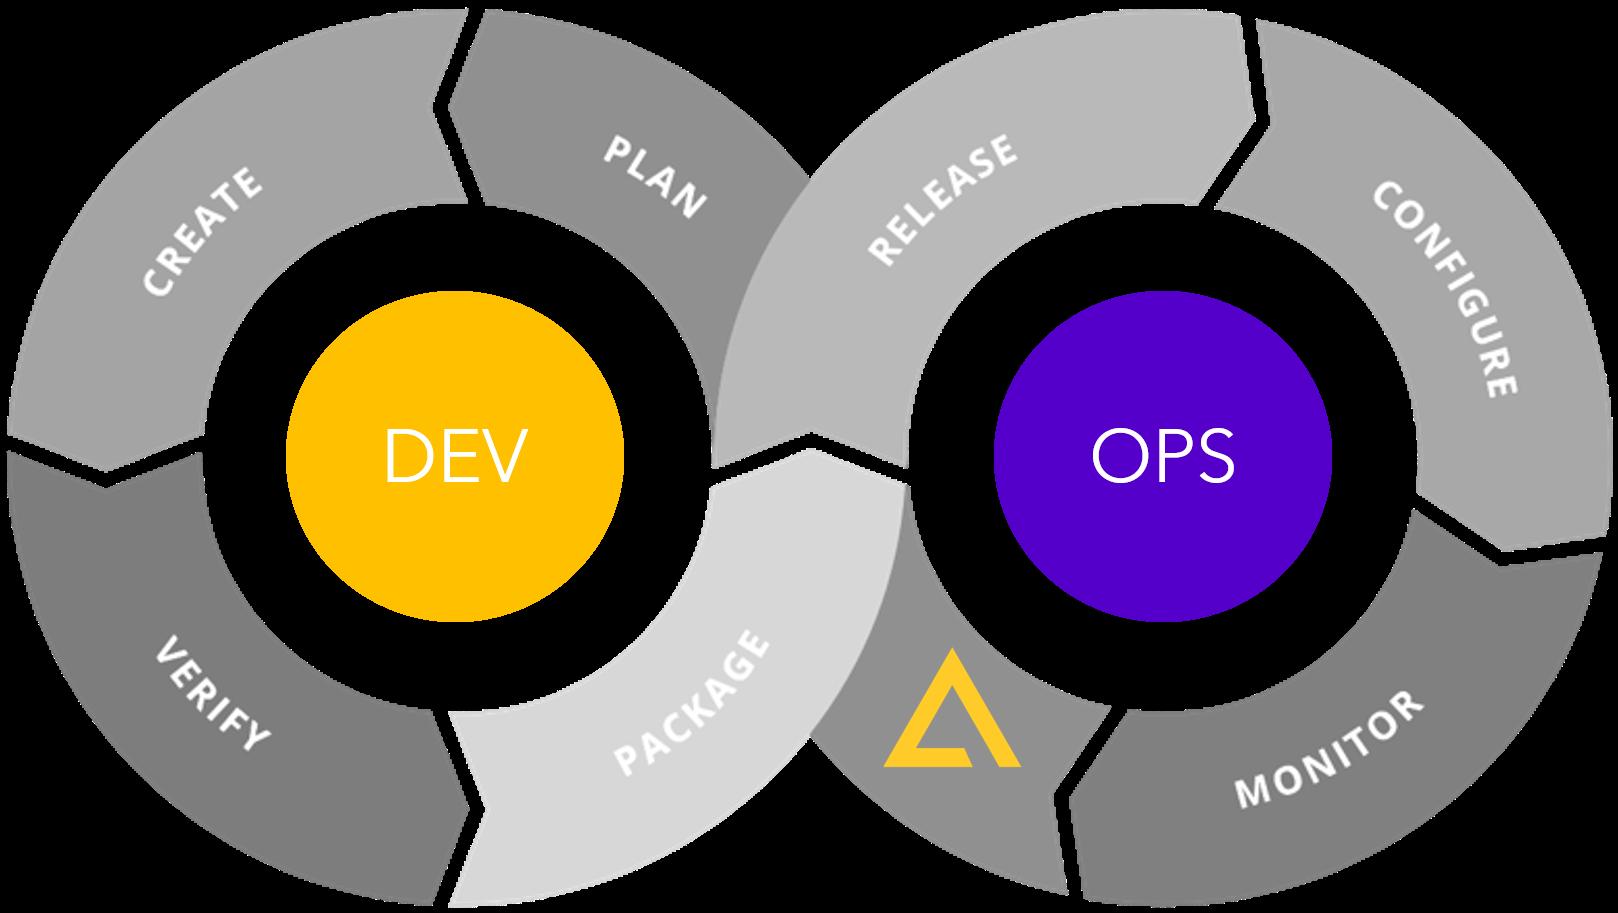 Content DevOps is important for Content Architecture